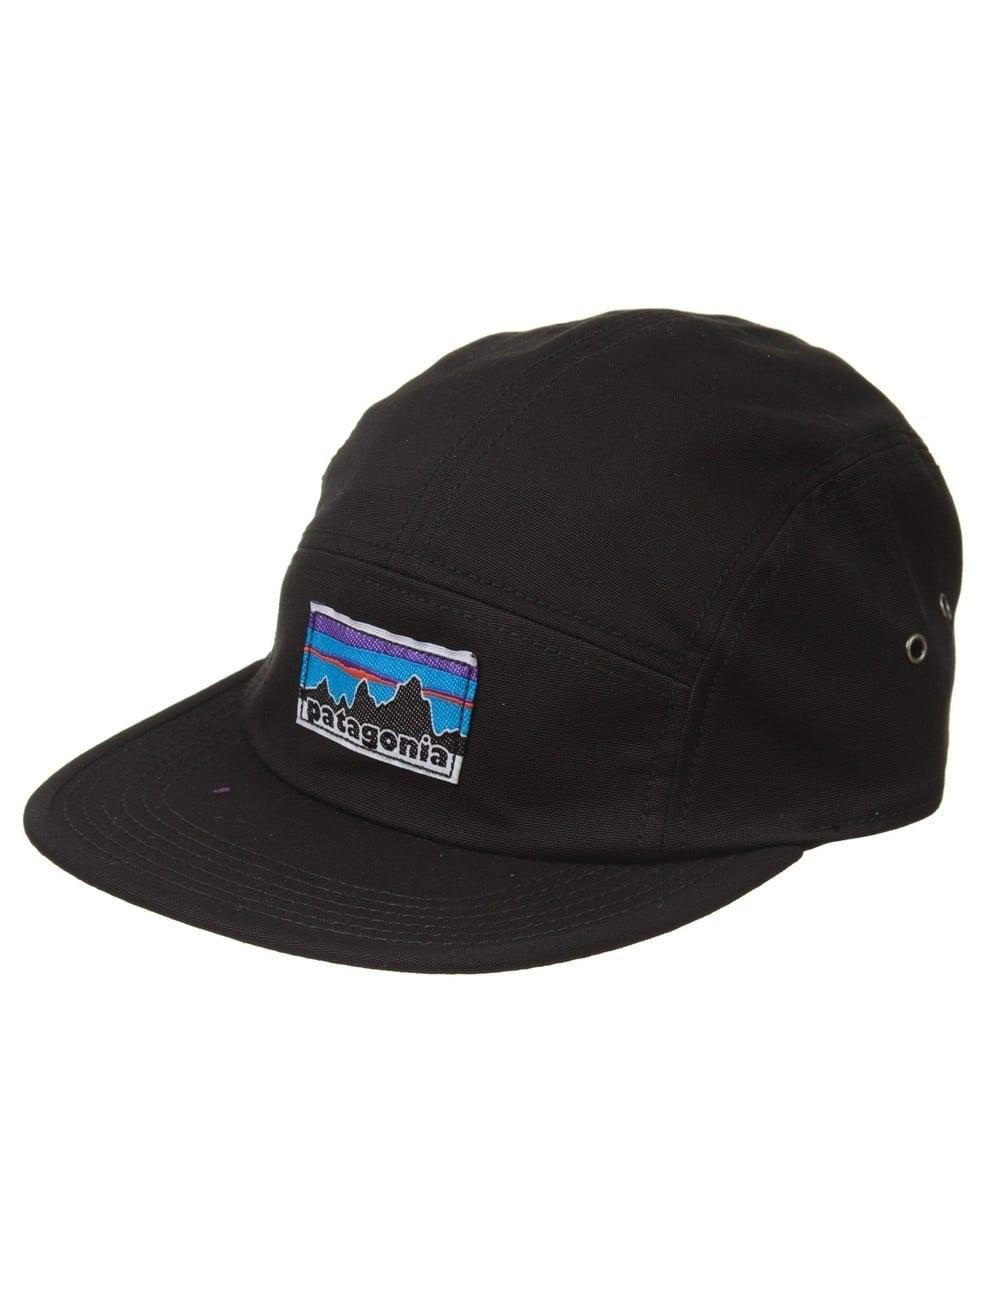 Patagonia Retro Fitz Roy Label Tradesmith Cap - Black - Accessories ... 71866ea813f